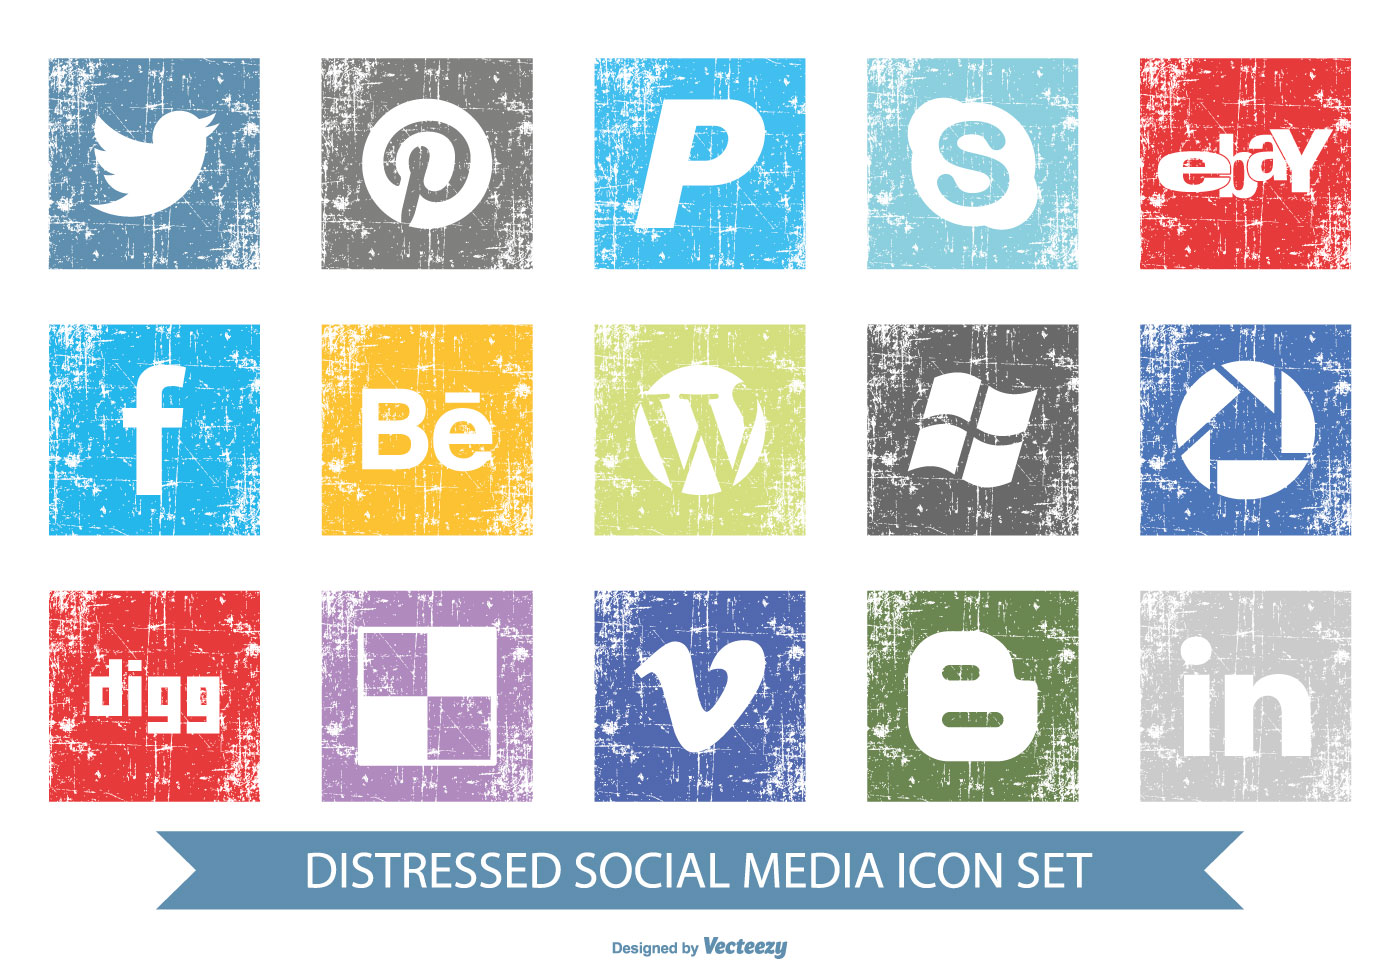 vector-distressed-social-media-icon-set.jpg